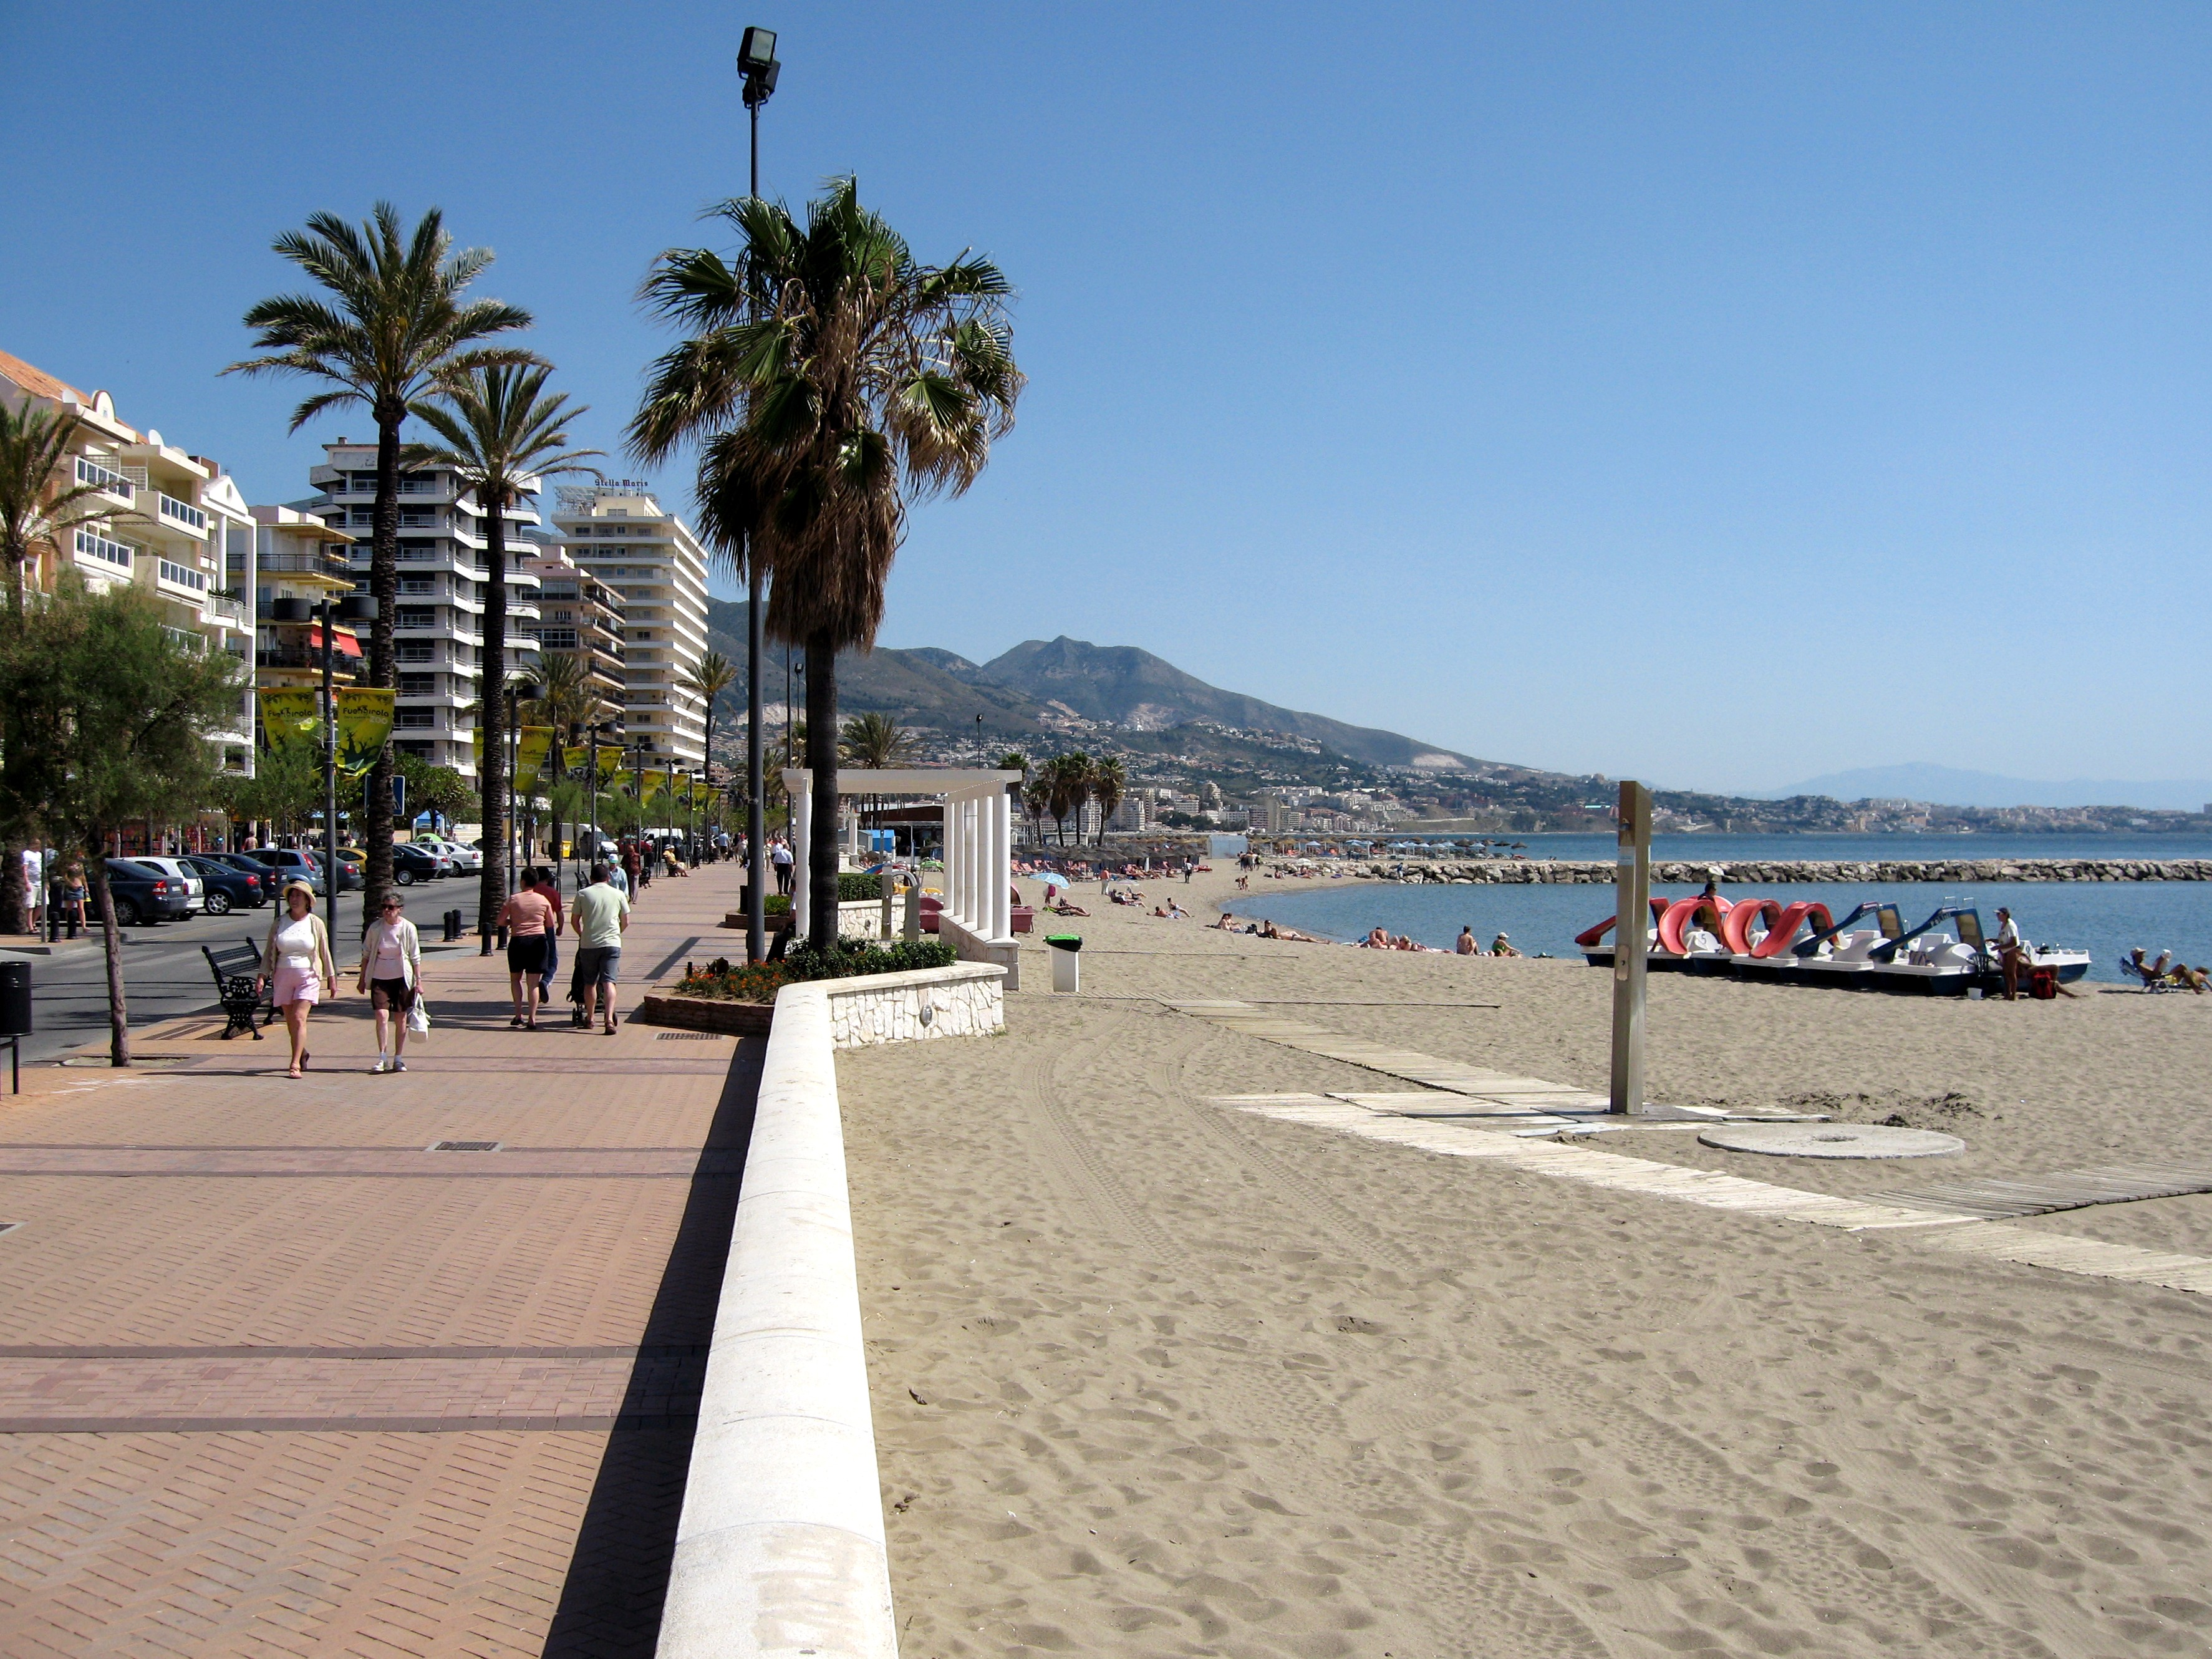 File fuengirola playa wikimedia commons - Foto van de show ...